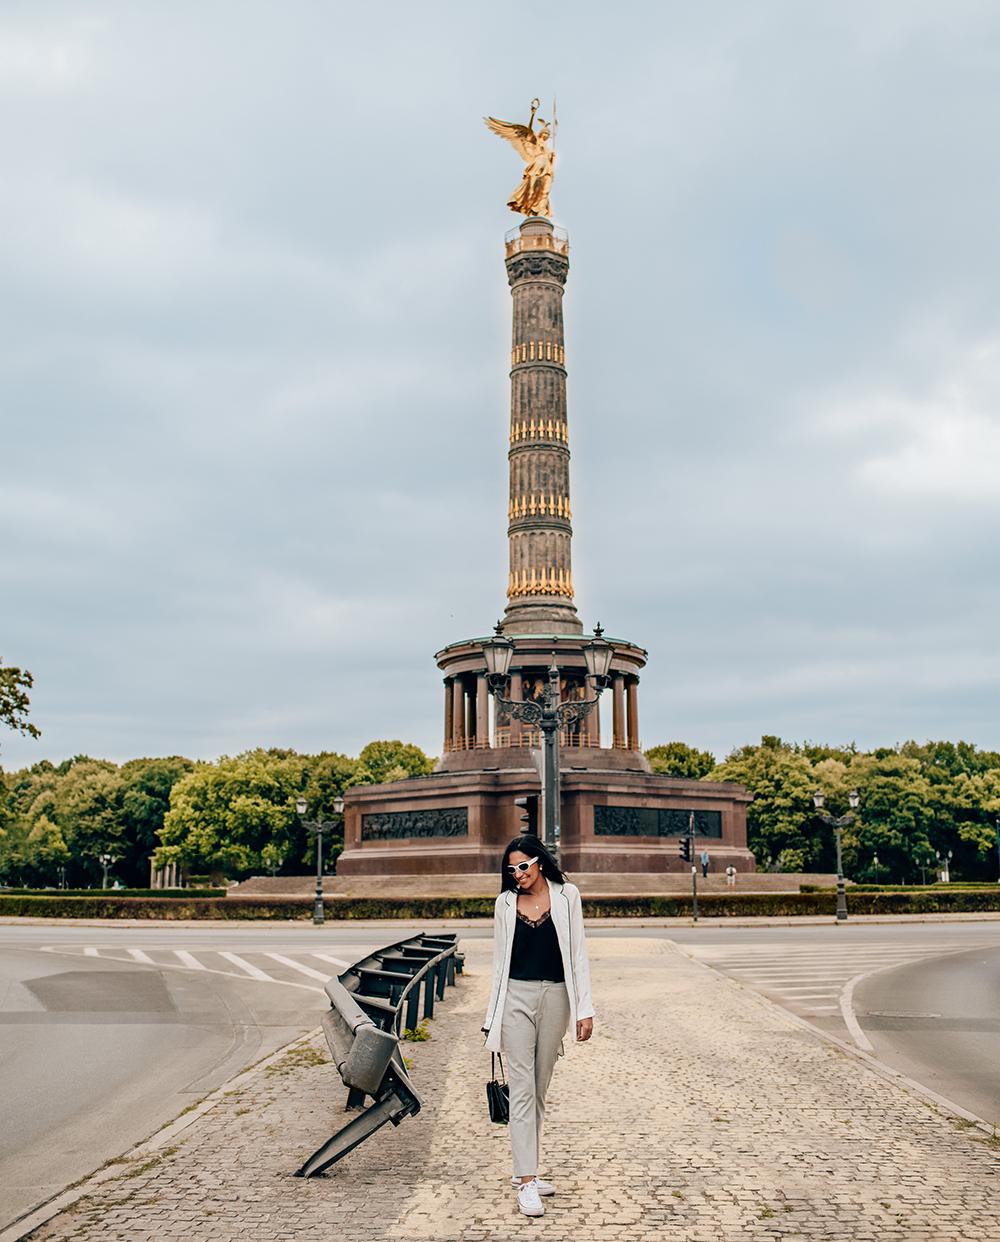 Berlin_VictoryColumn